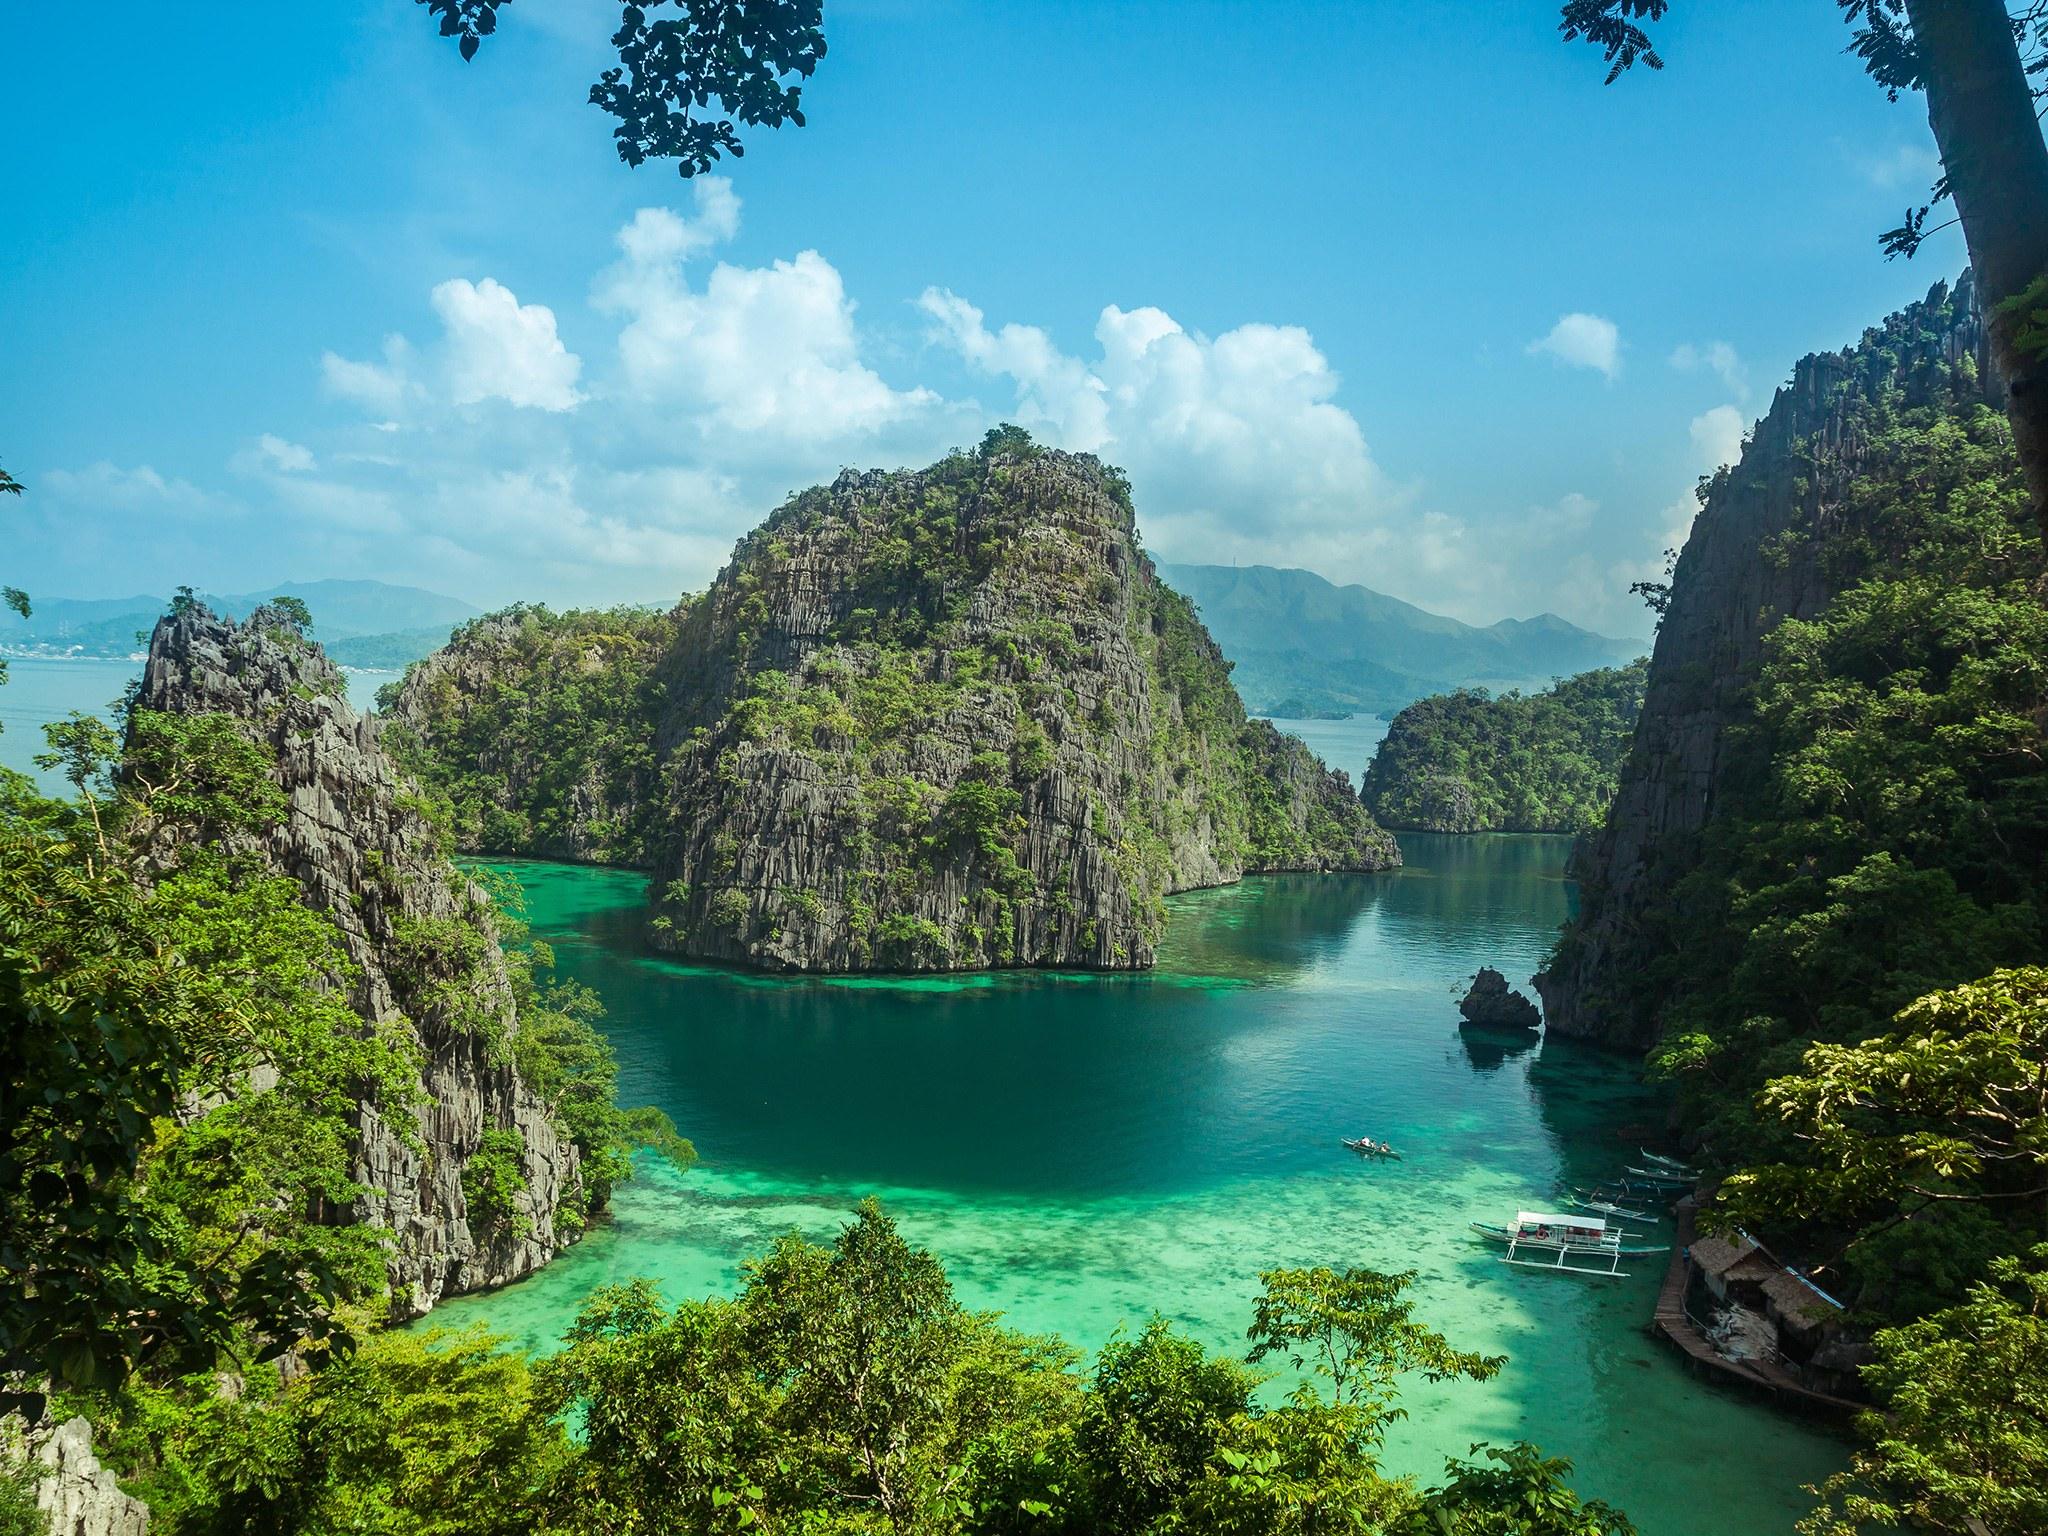 palawan-philippines-coron-cr-alamy